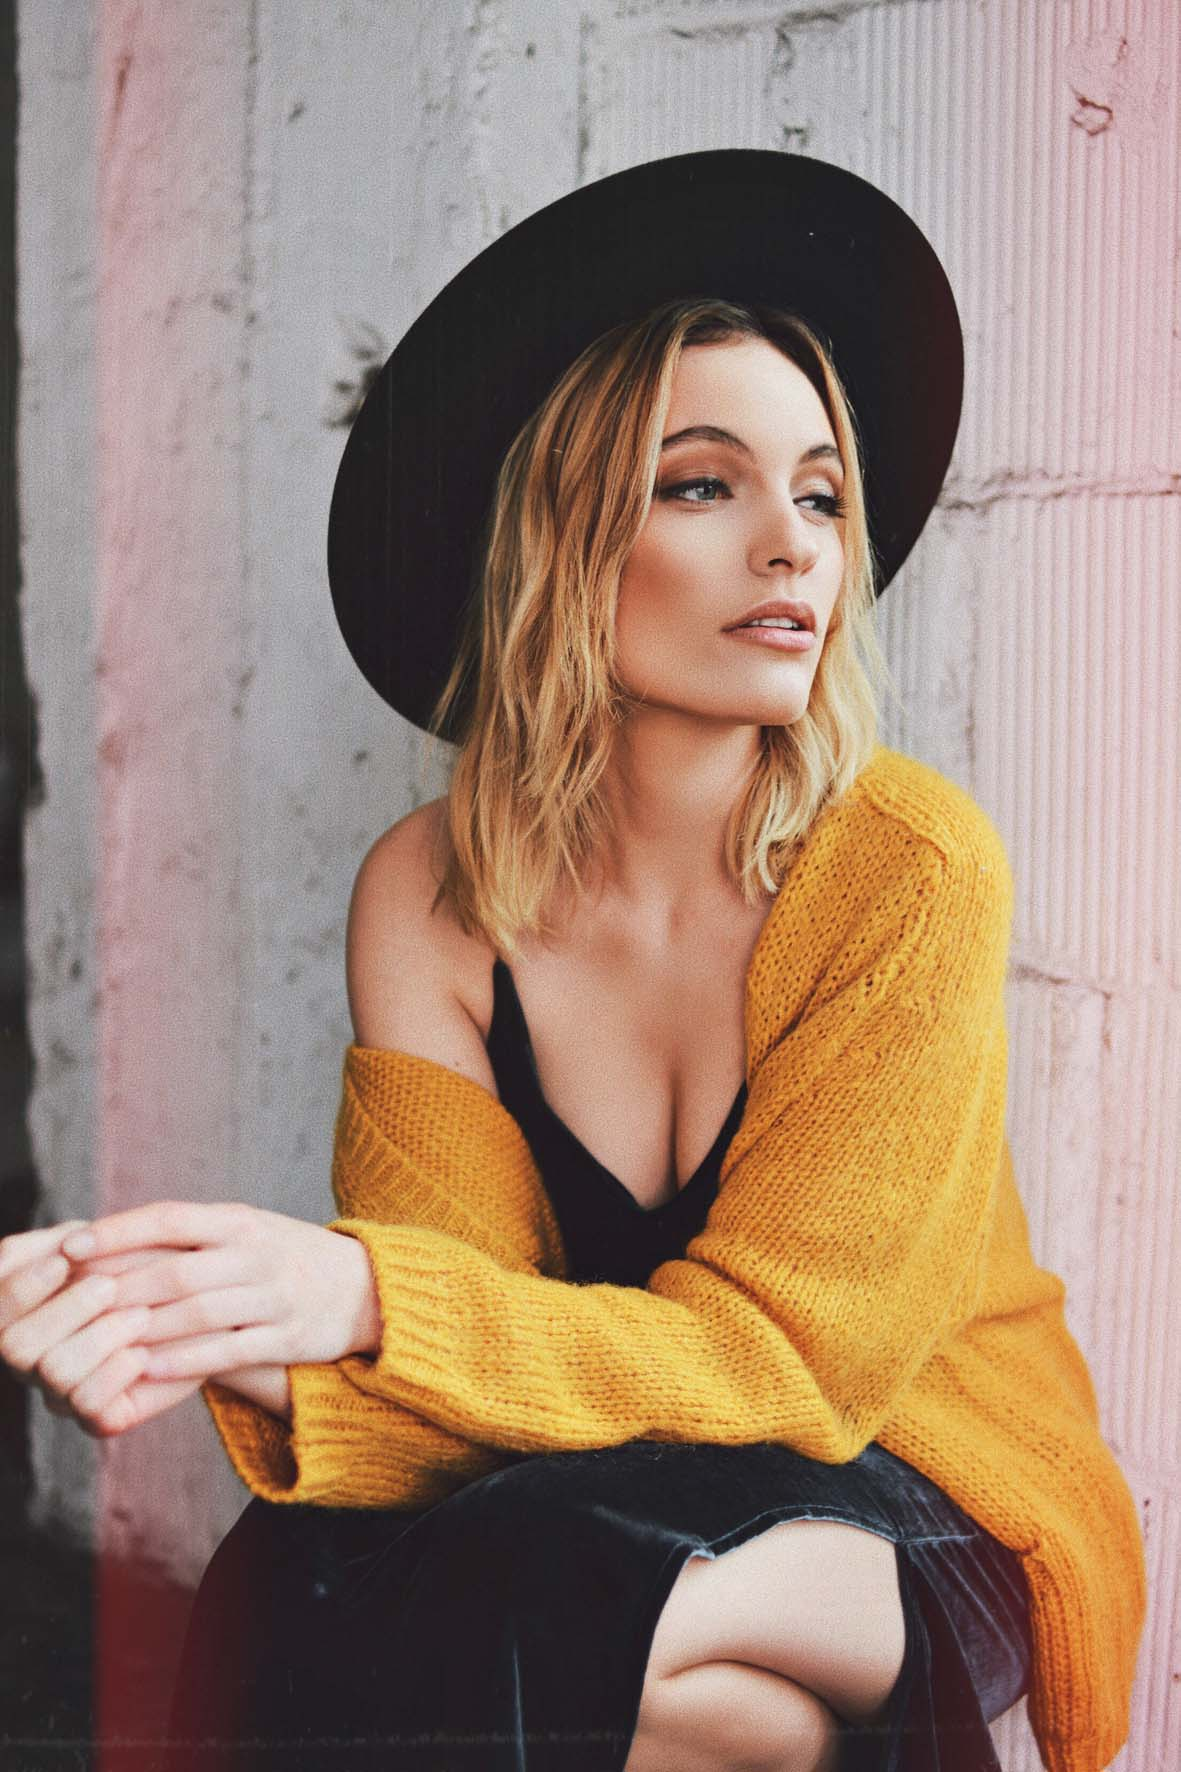 Lena im Streetlook mit Hut und gelbem Cardigan